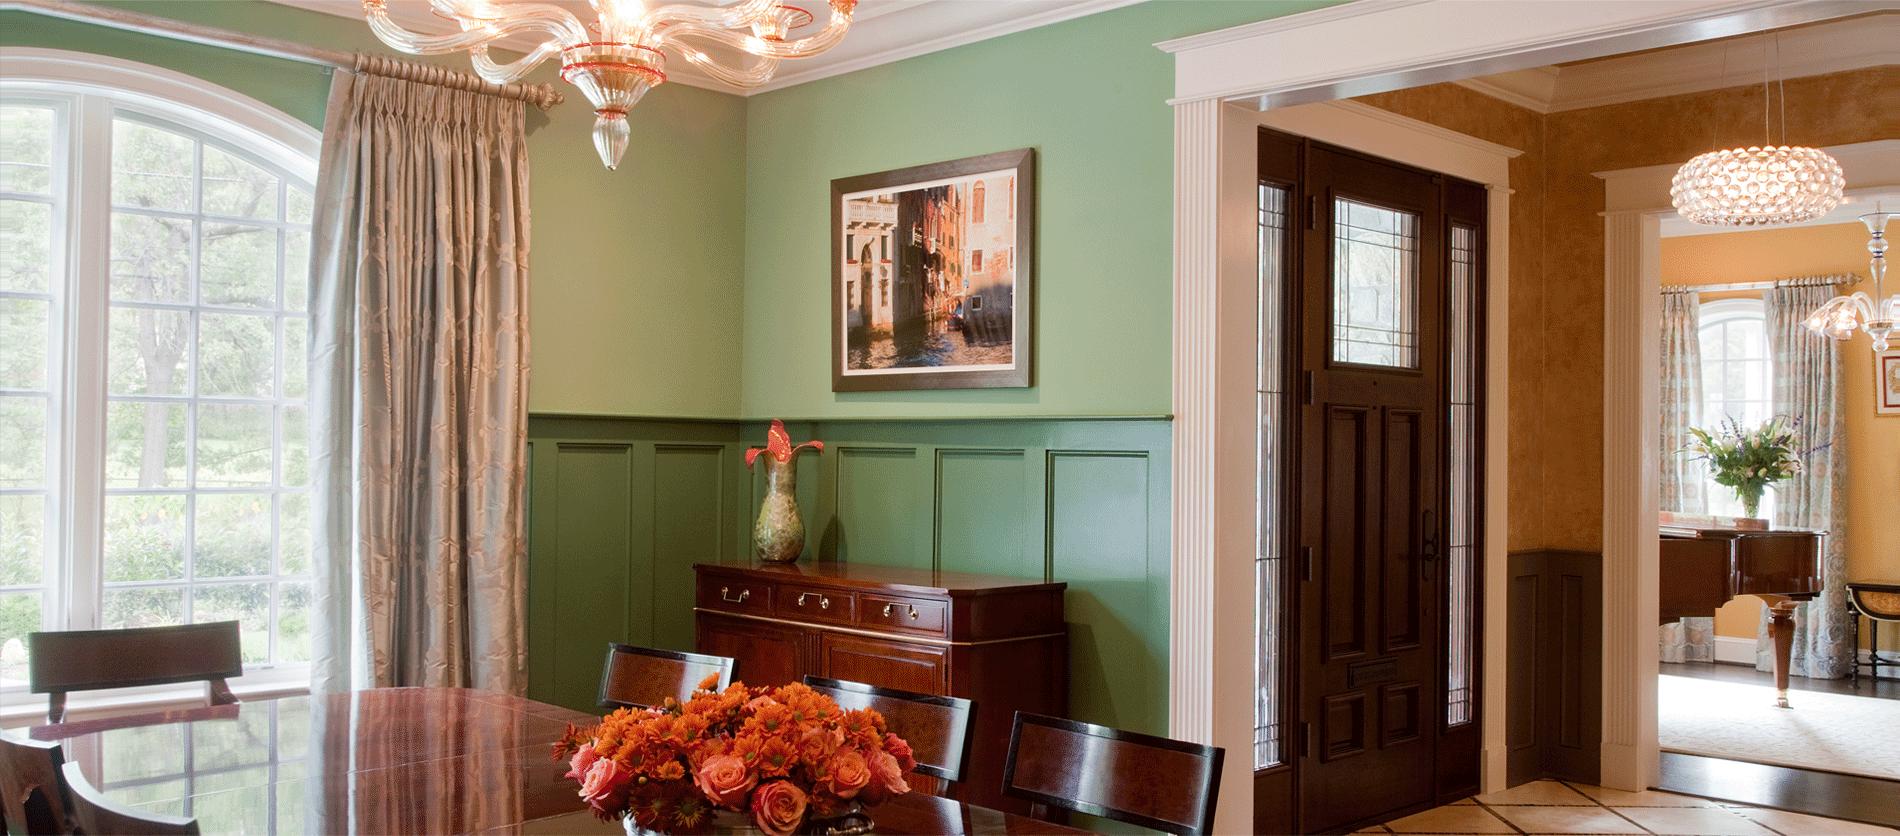 Dunn-Right Contracting - home interior design ideas